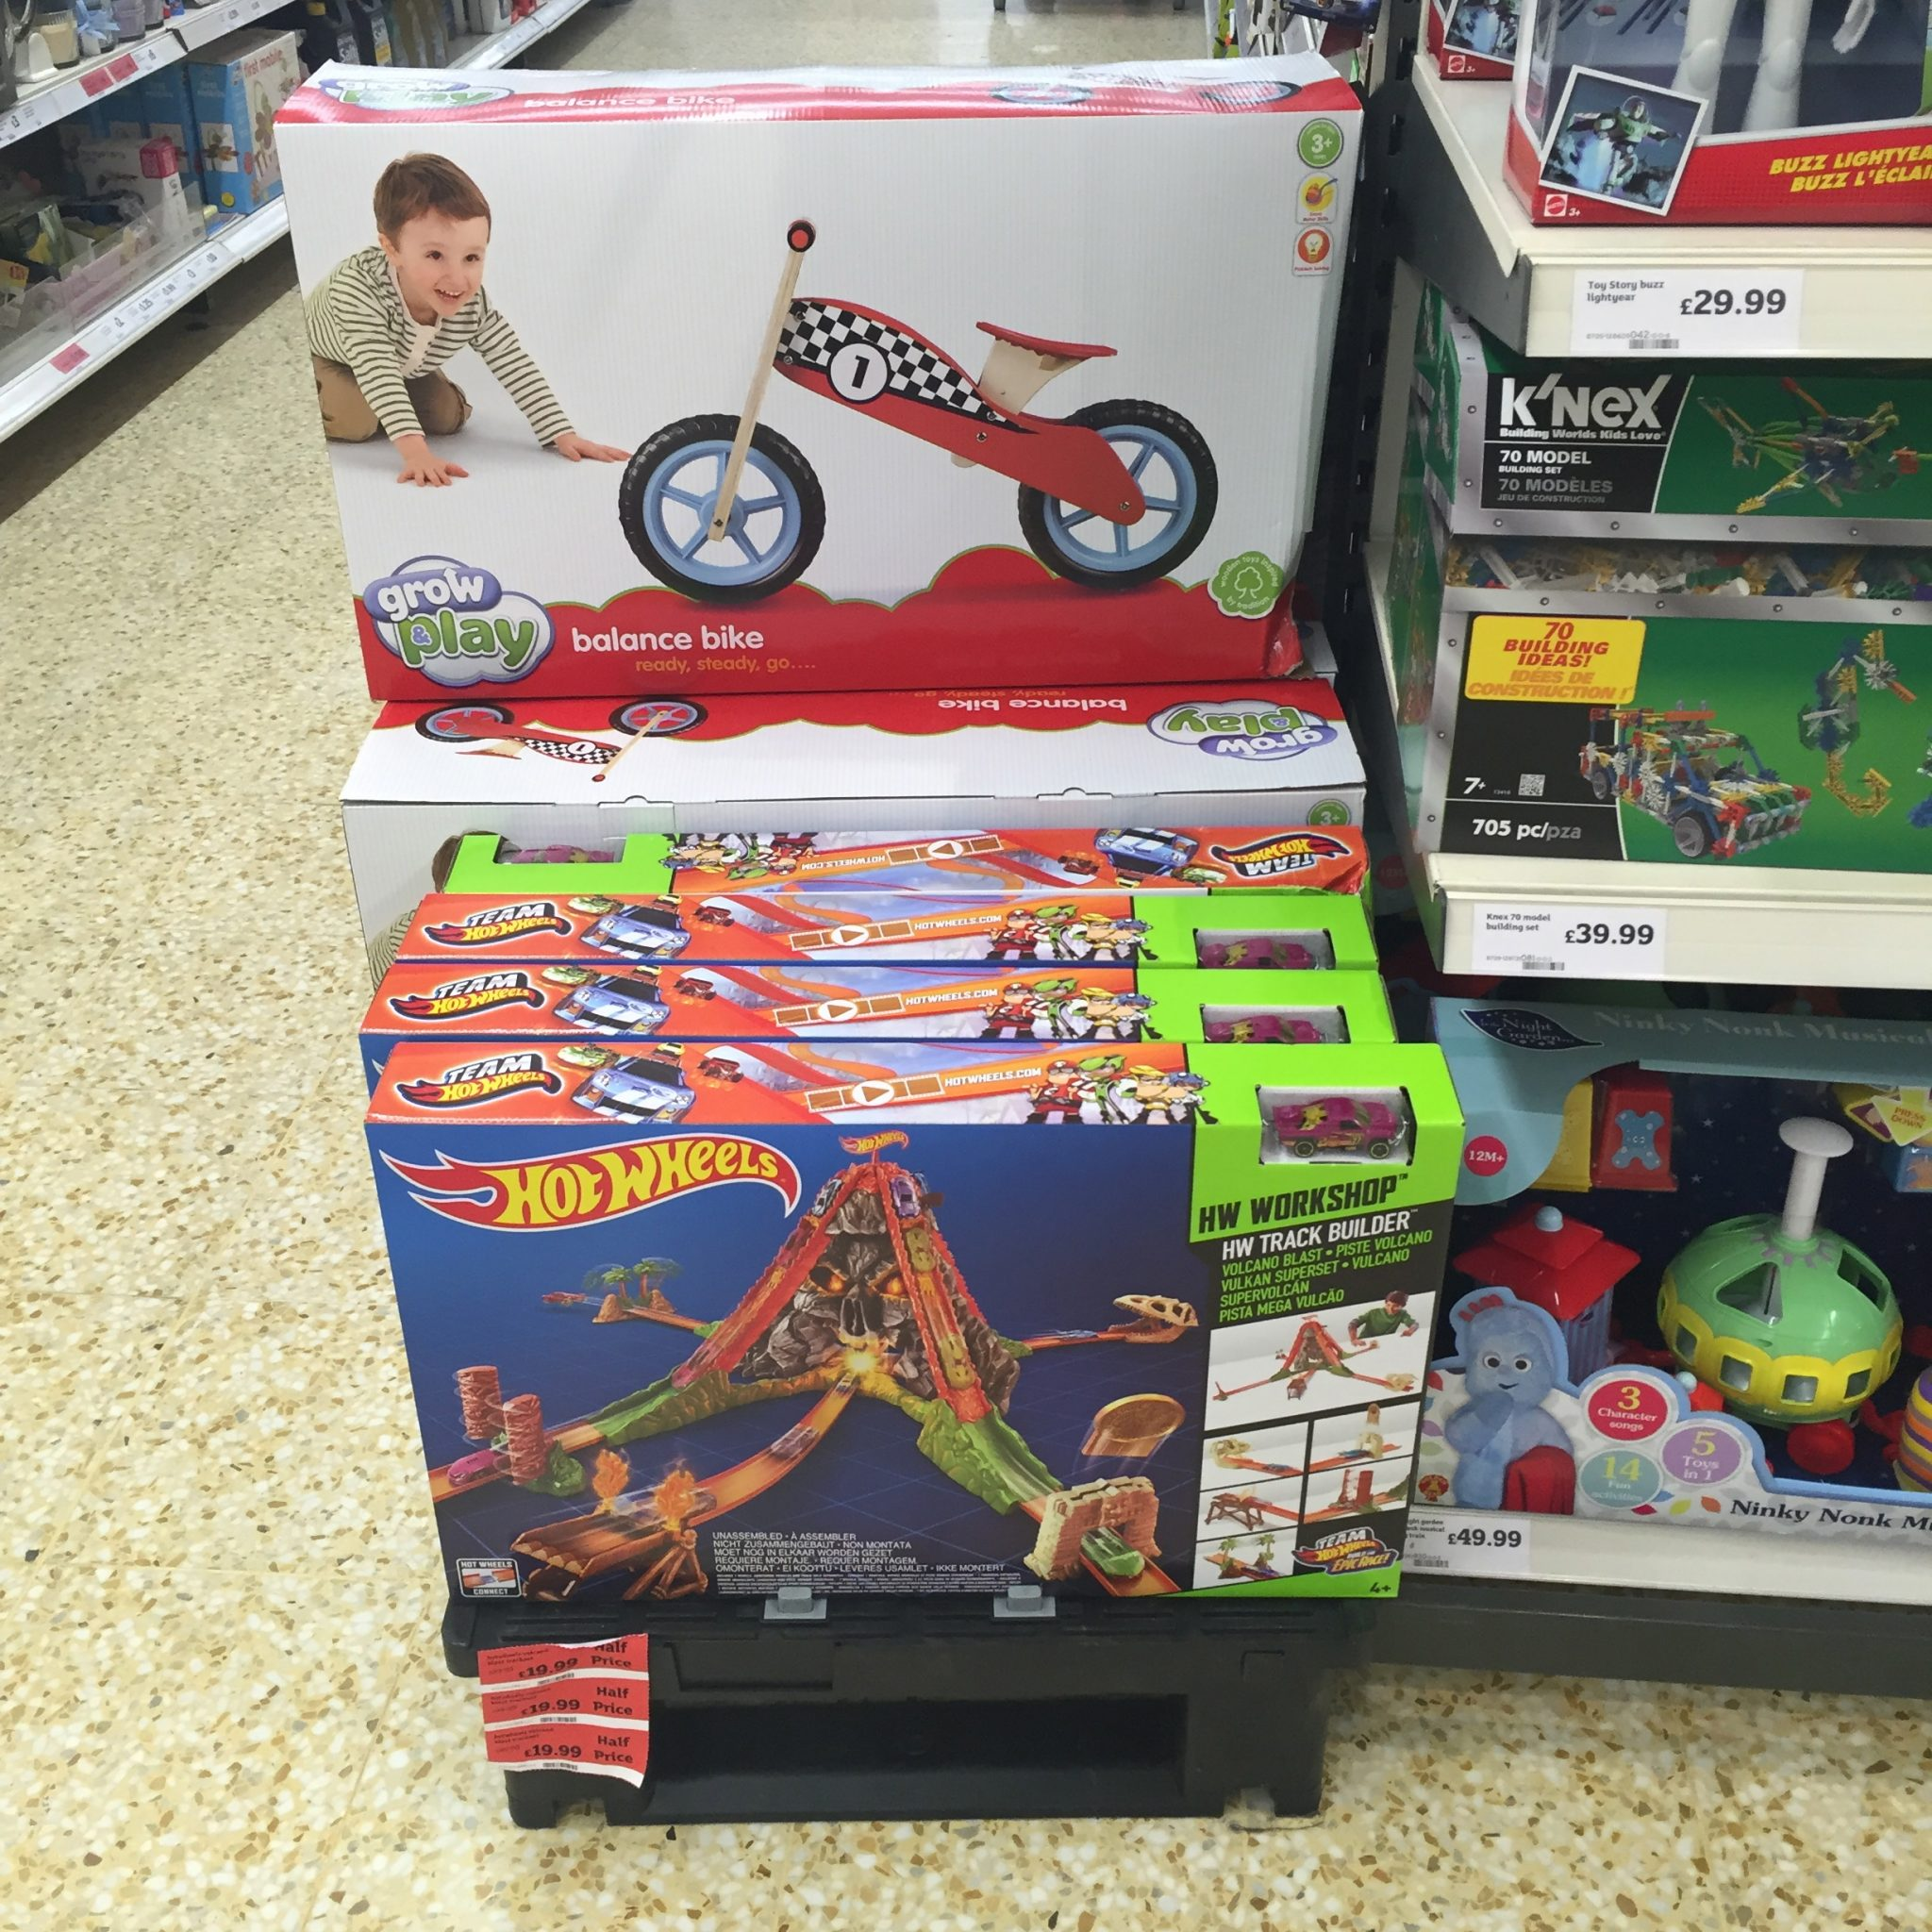 sainsbury's toy sale - photo #27